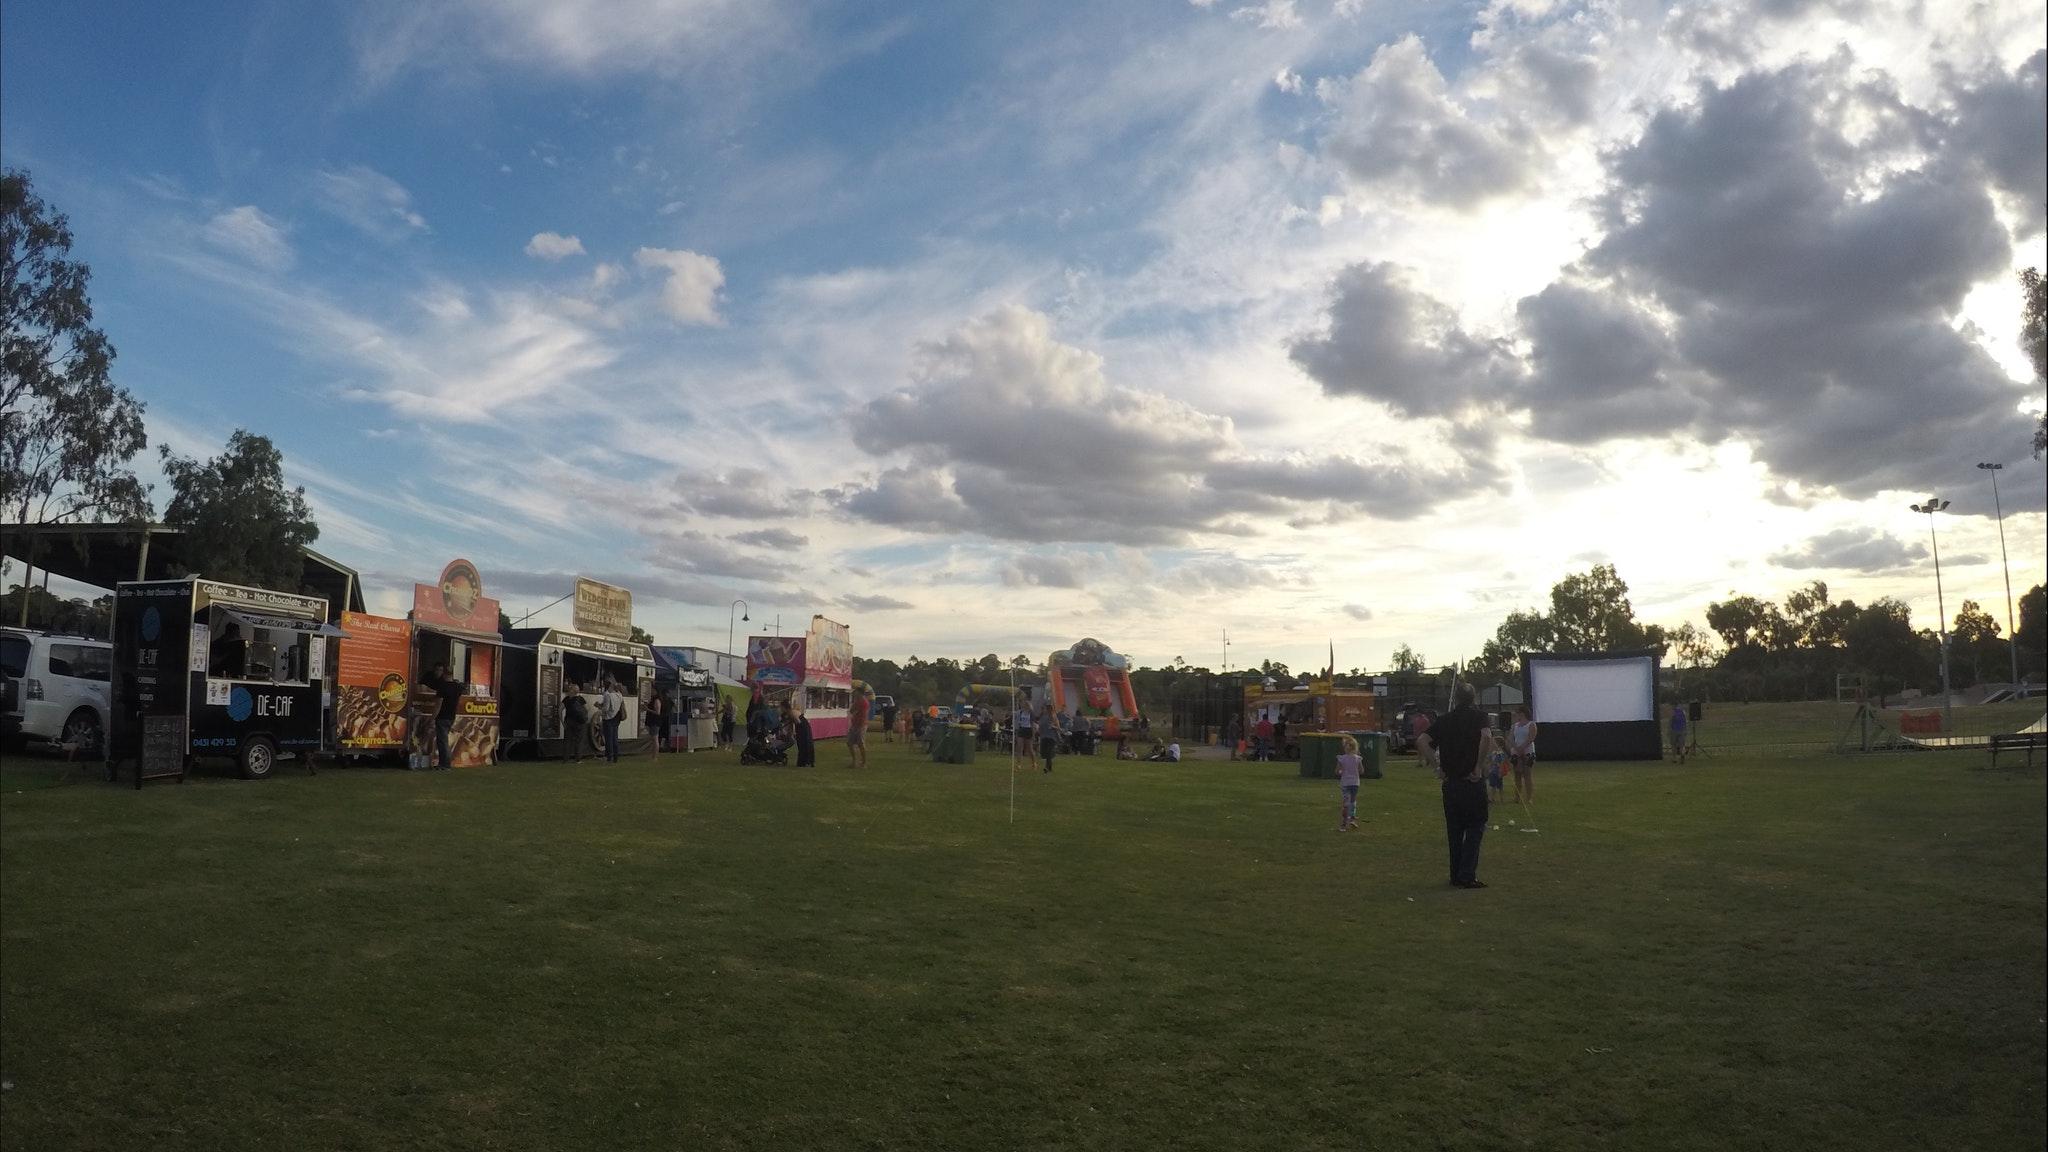 Peninsula Busking Festival